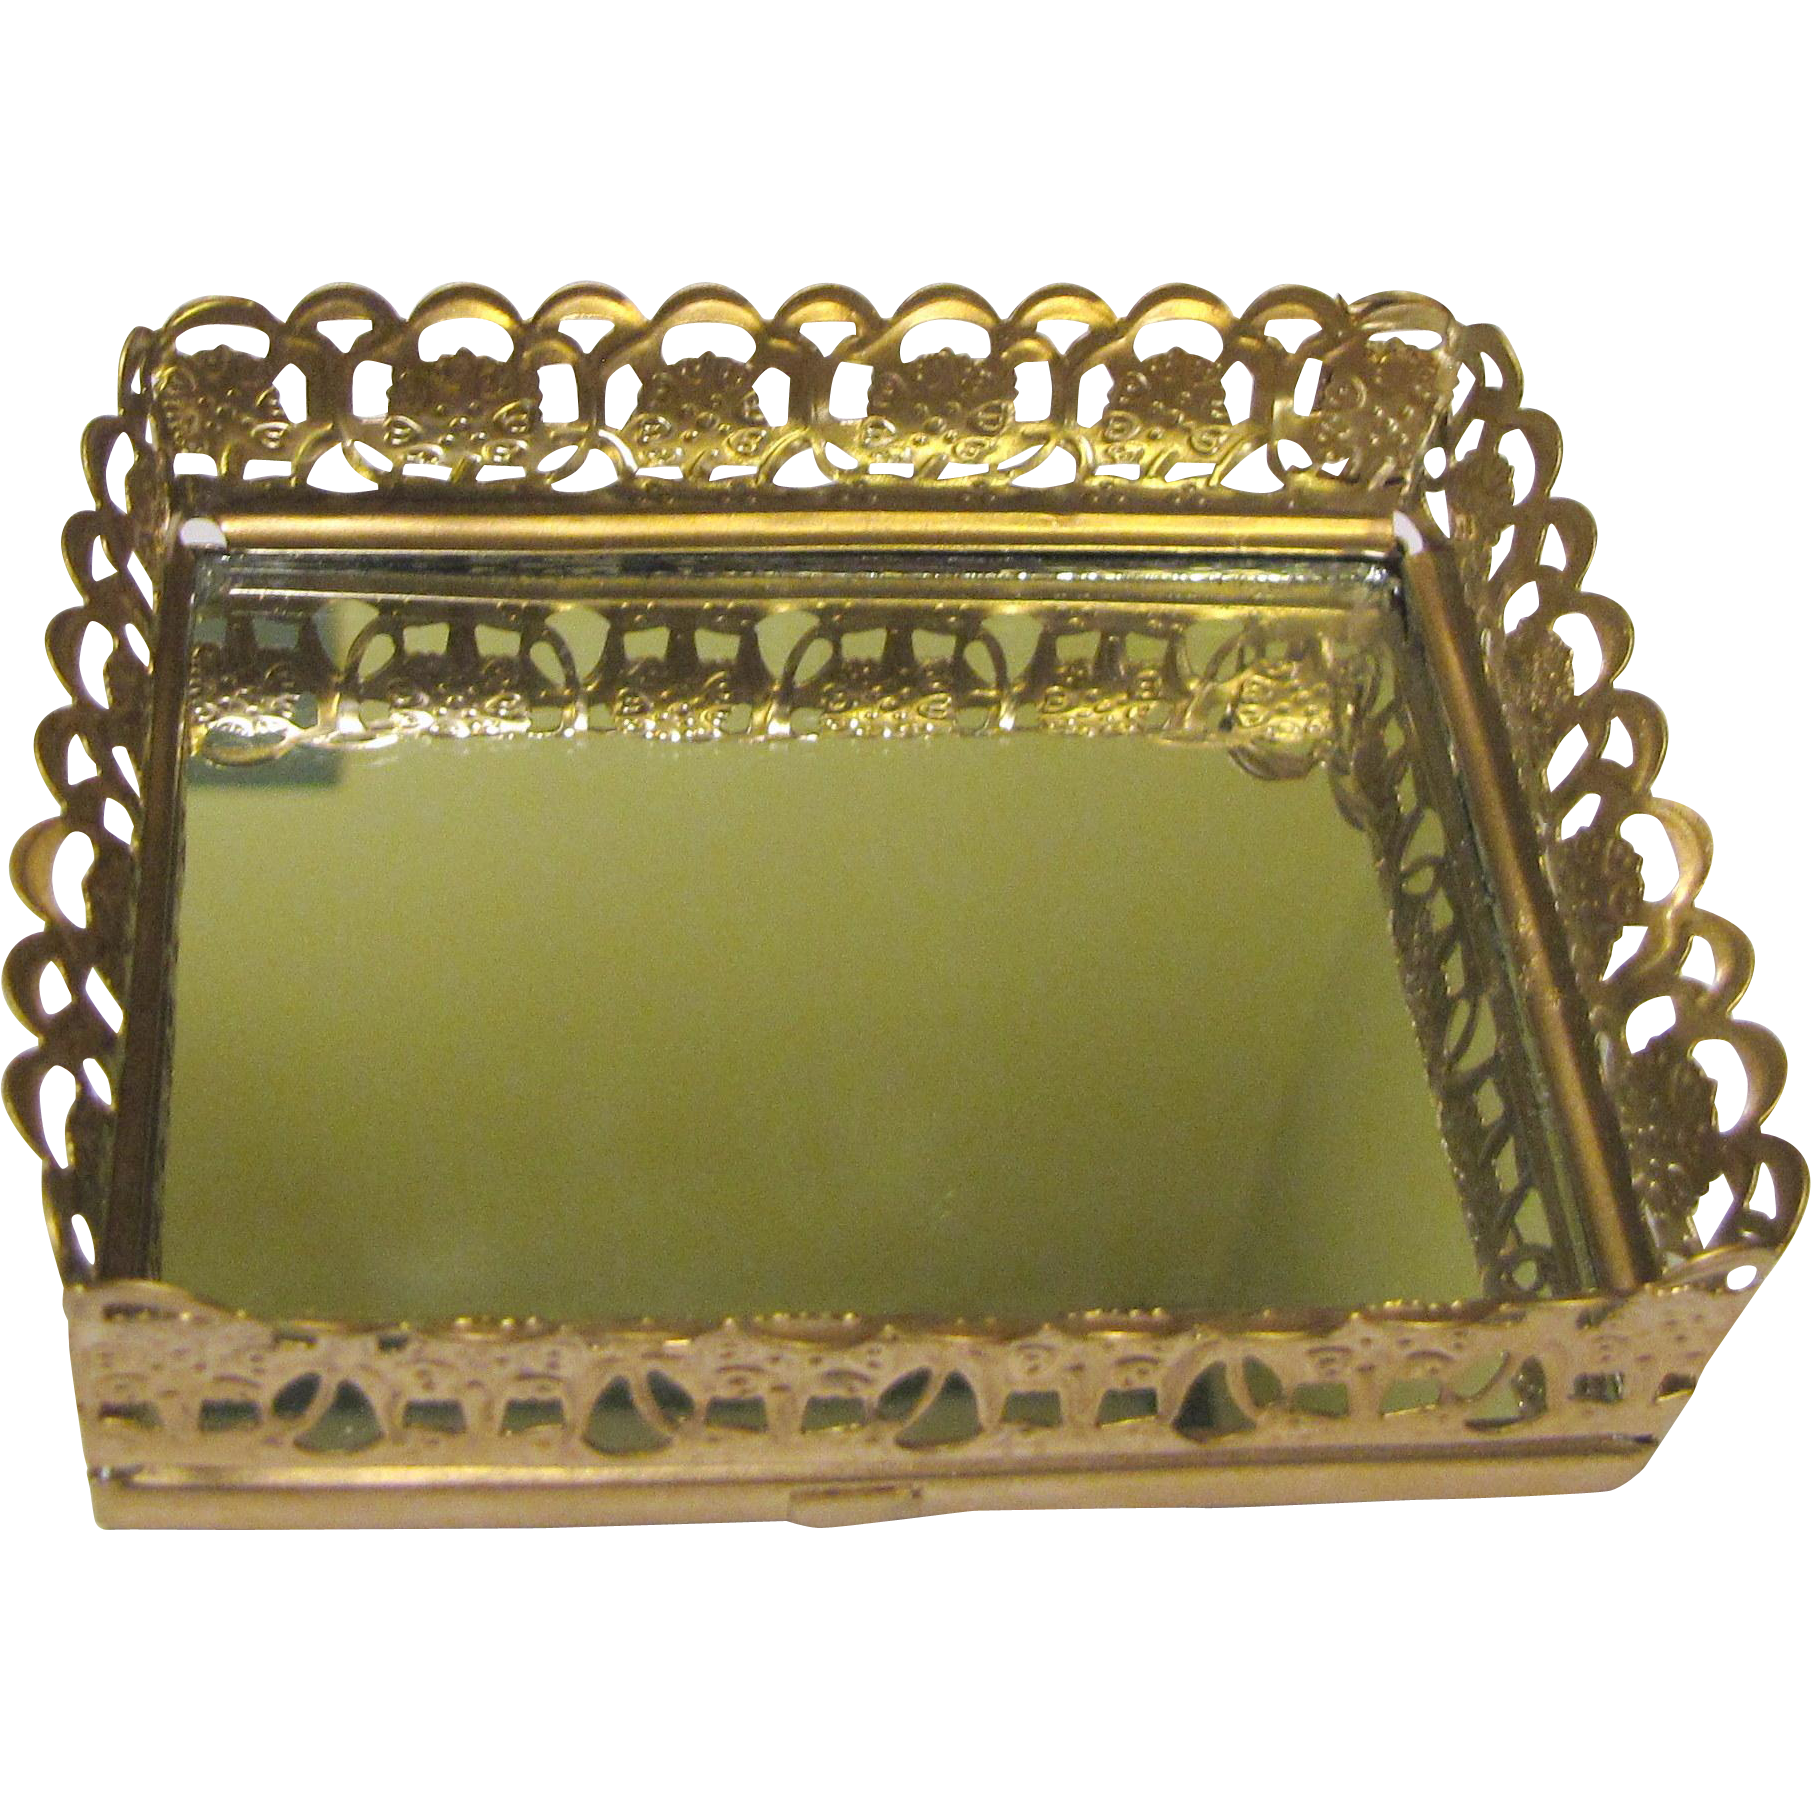 Elegant Mini Gilt Mirrored Vanity Tray From